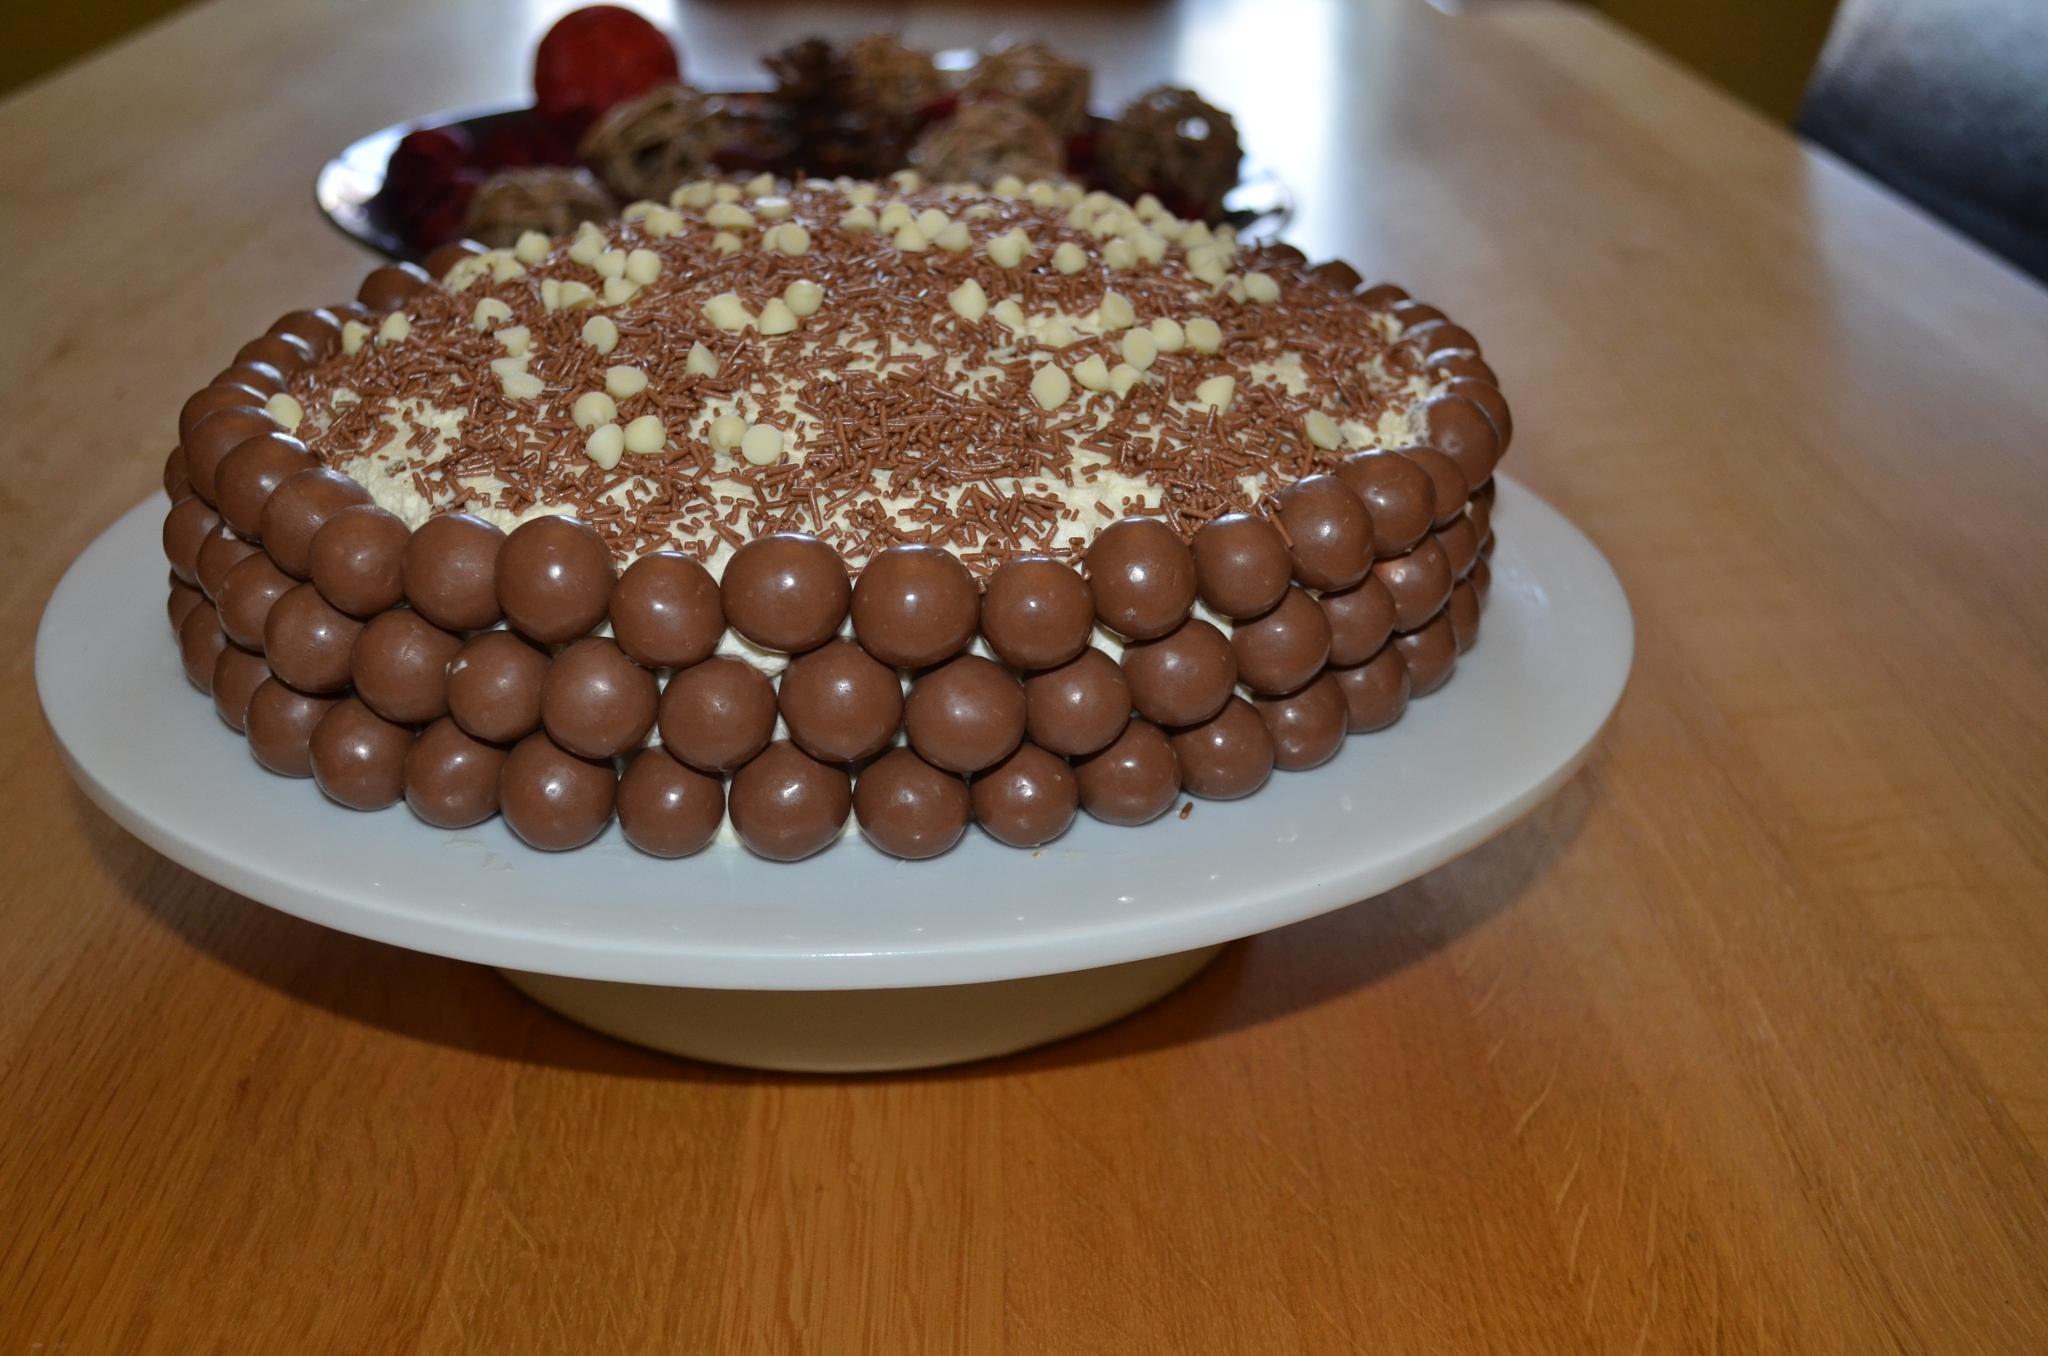 Cake for Easter by ksoar1